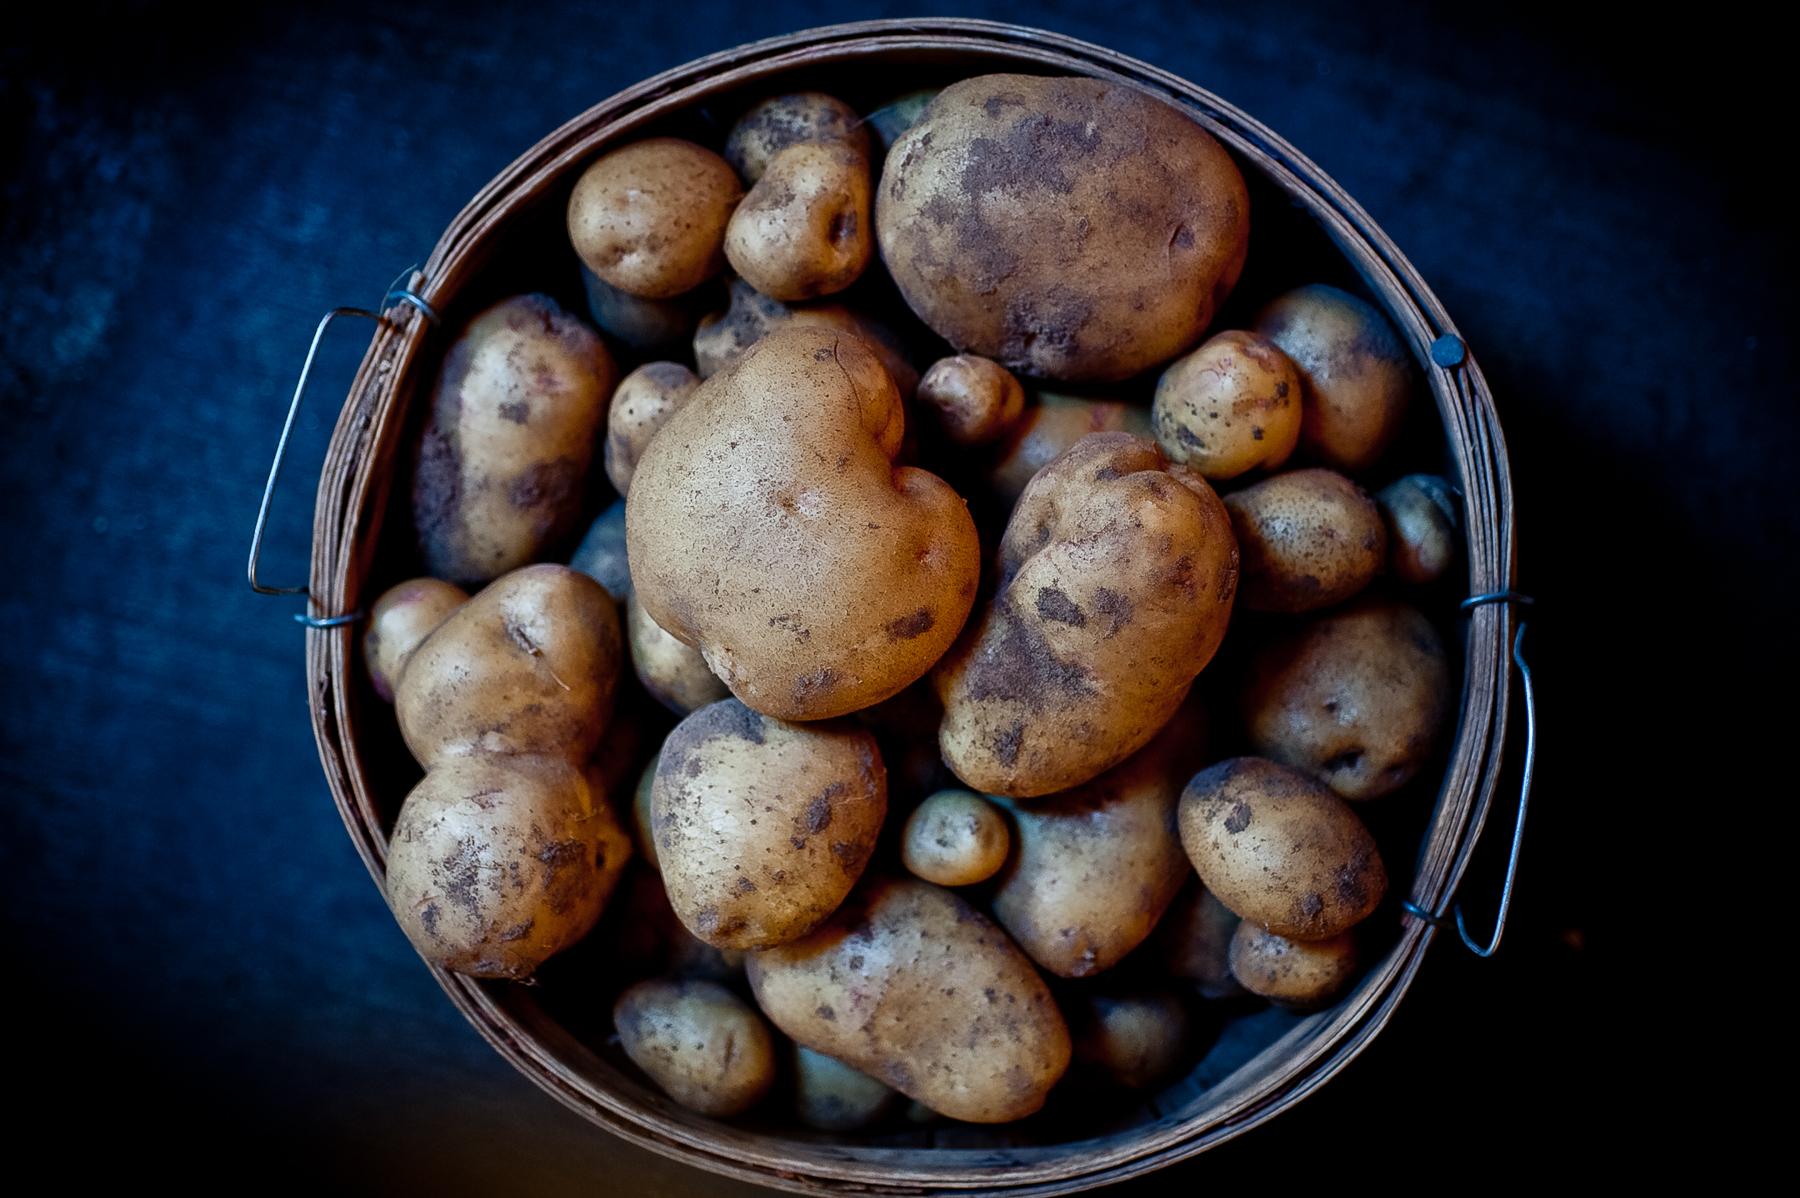 potatoes farm.jpg